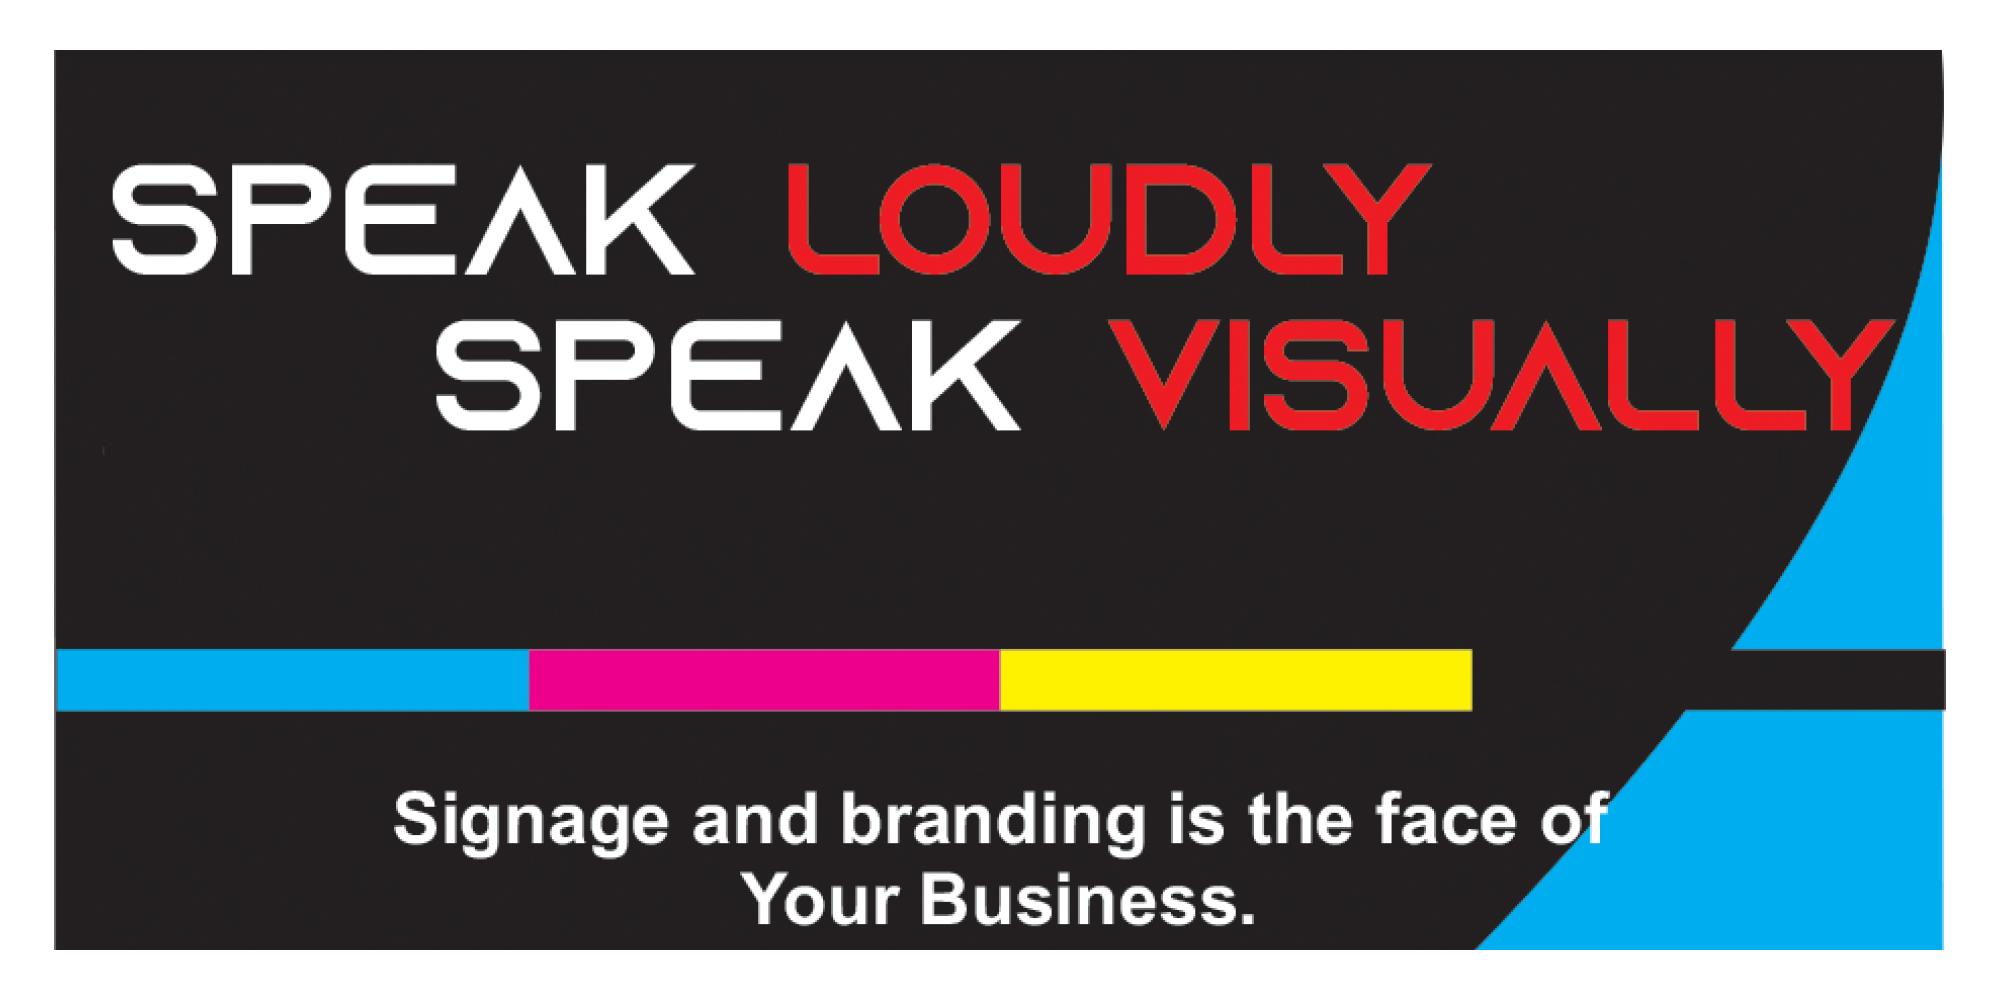 Speak Loudly Speak Visually